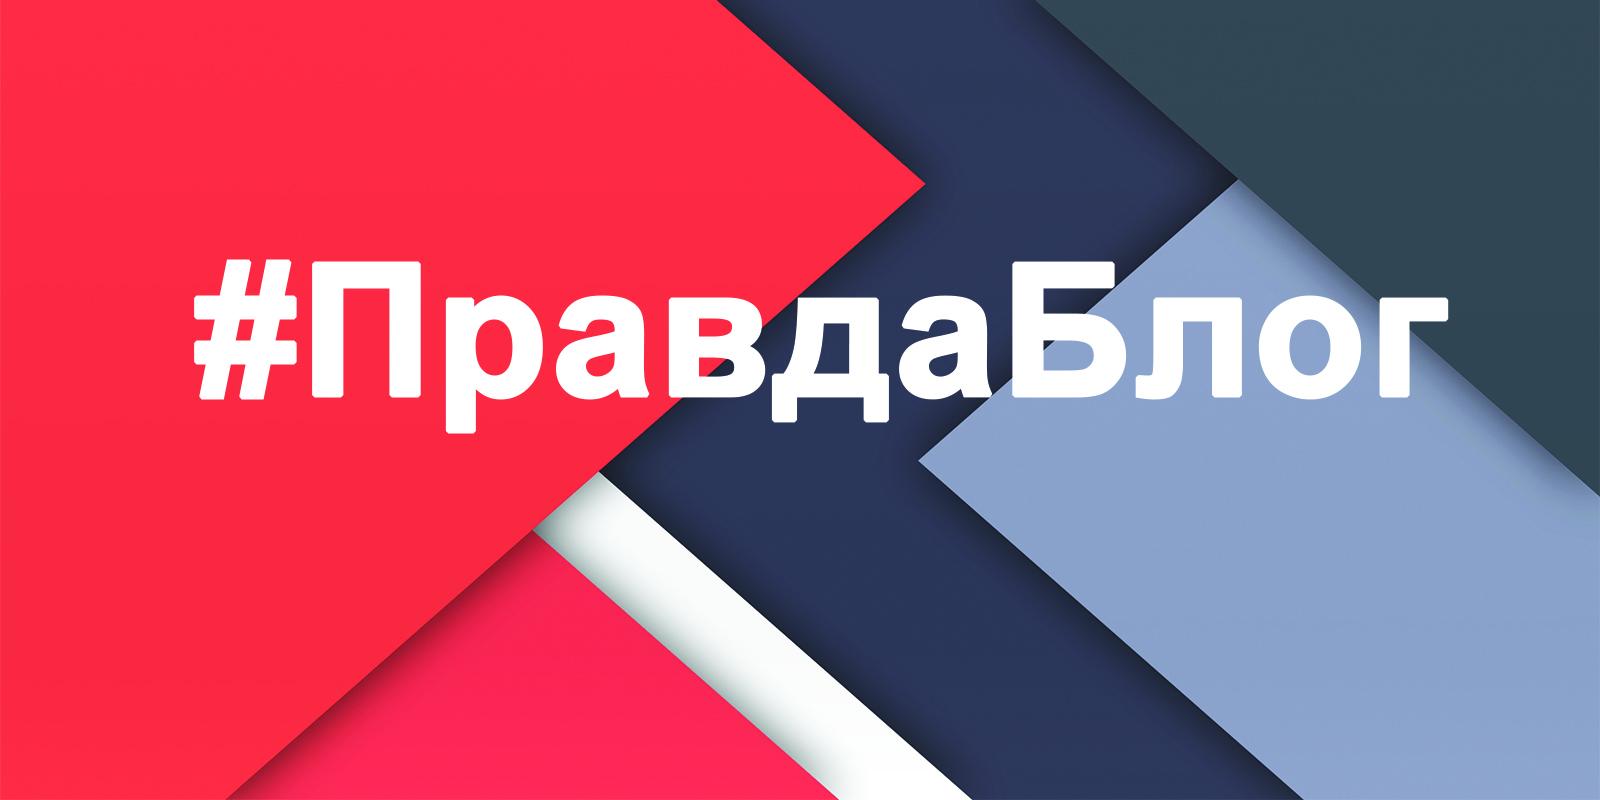 Правдаблог